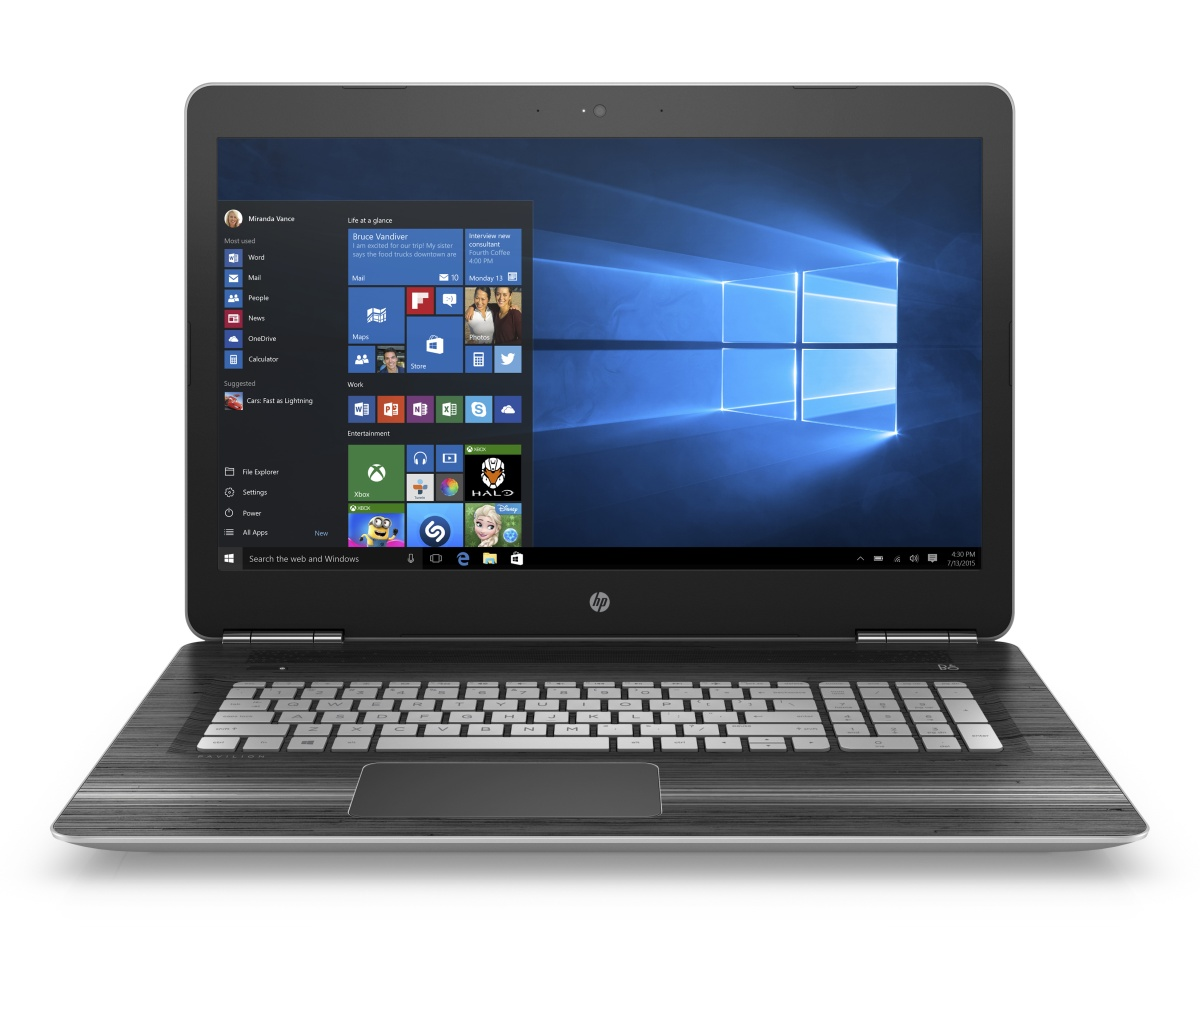 "HP Pavilion gaming 17-ab202nc/Intel i7-7700HQ/16GB/256 GB SSD + 1TB/DVDRW/ GTX 1050 4GB/17,3"" UHD/Win 10/stříbrná"